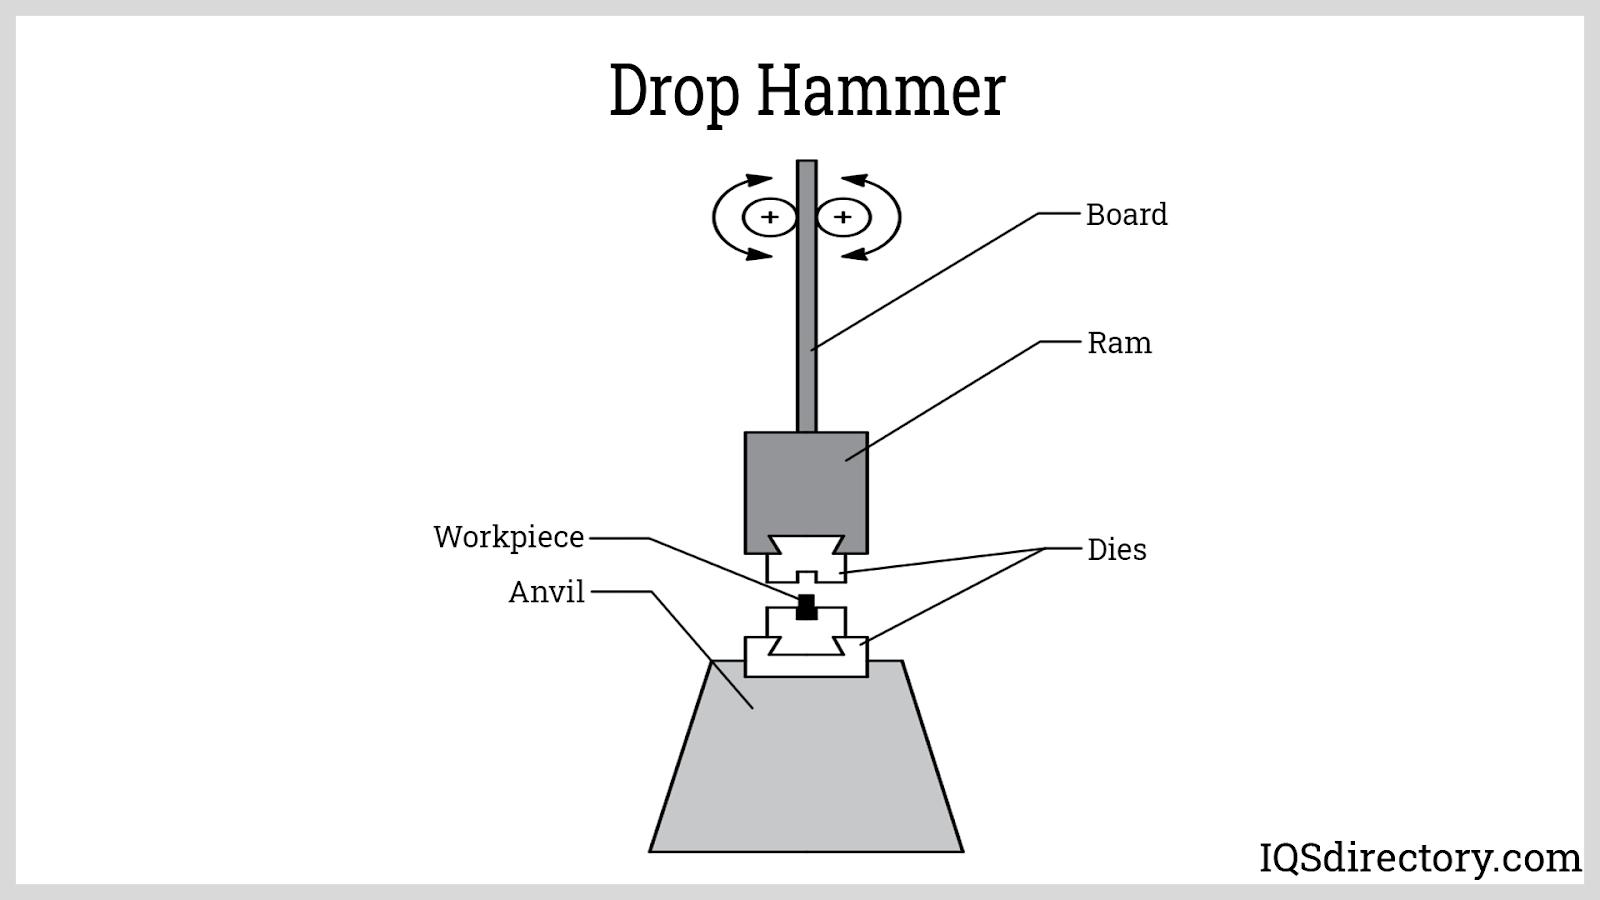 Drop Hammer